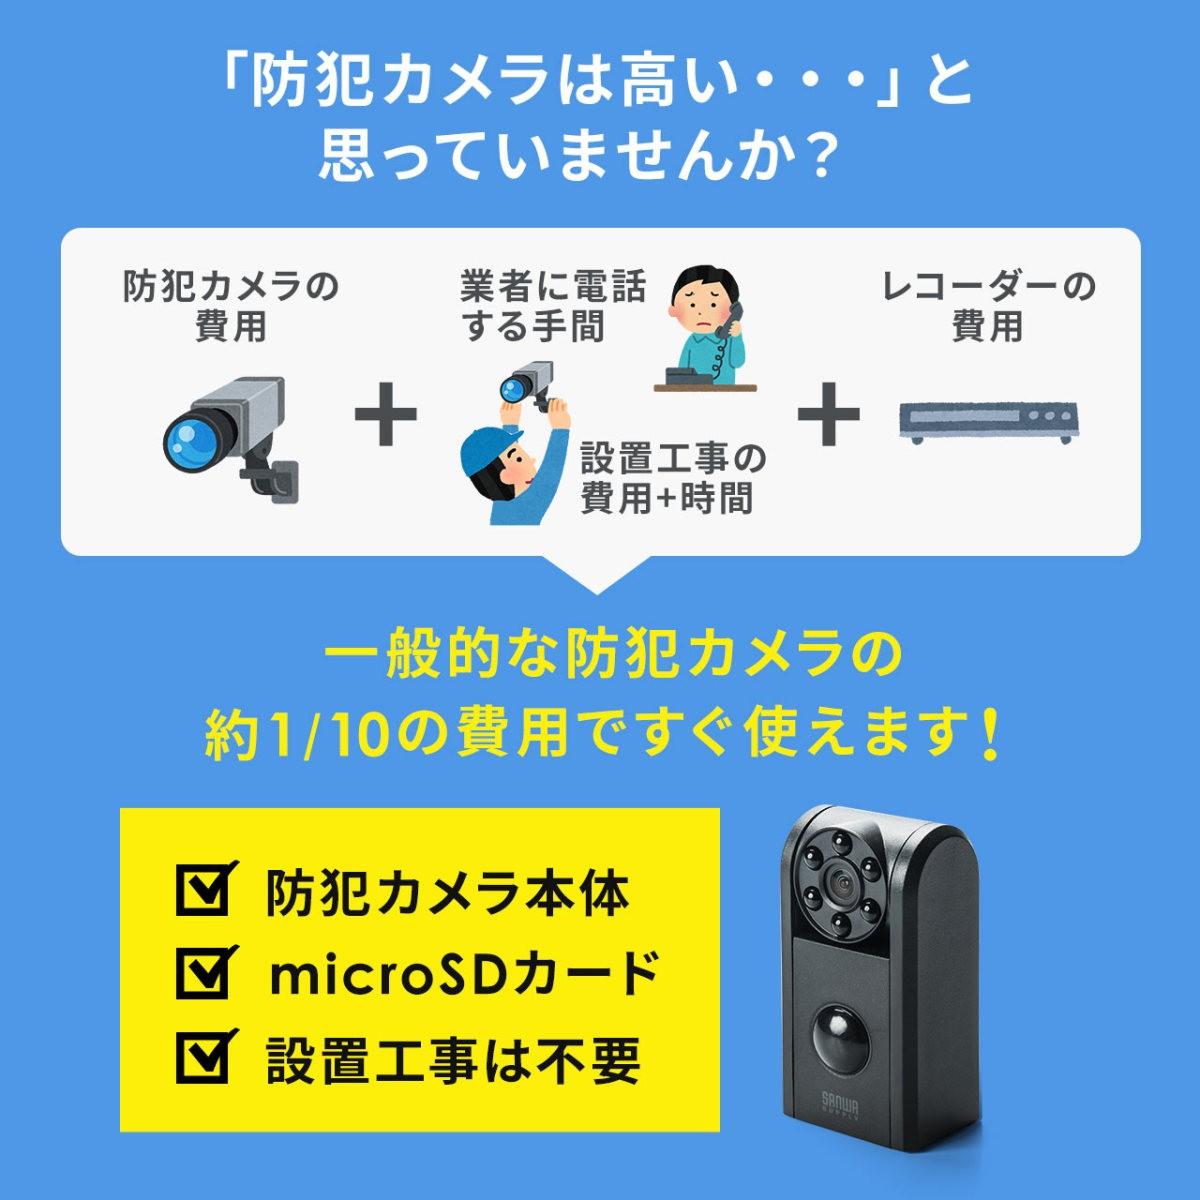 防犯カメラ 監視カメラ 家庭用 室内 防犯 小型 暗視 防犯用 家庭 充電式